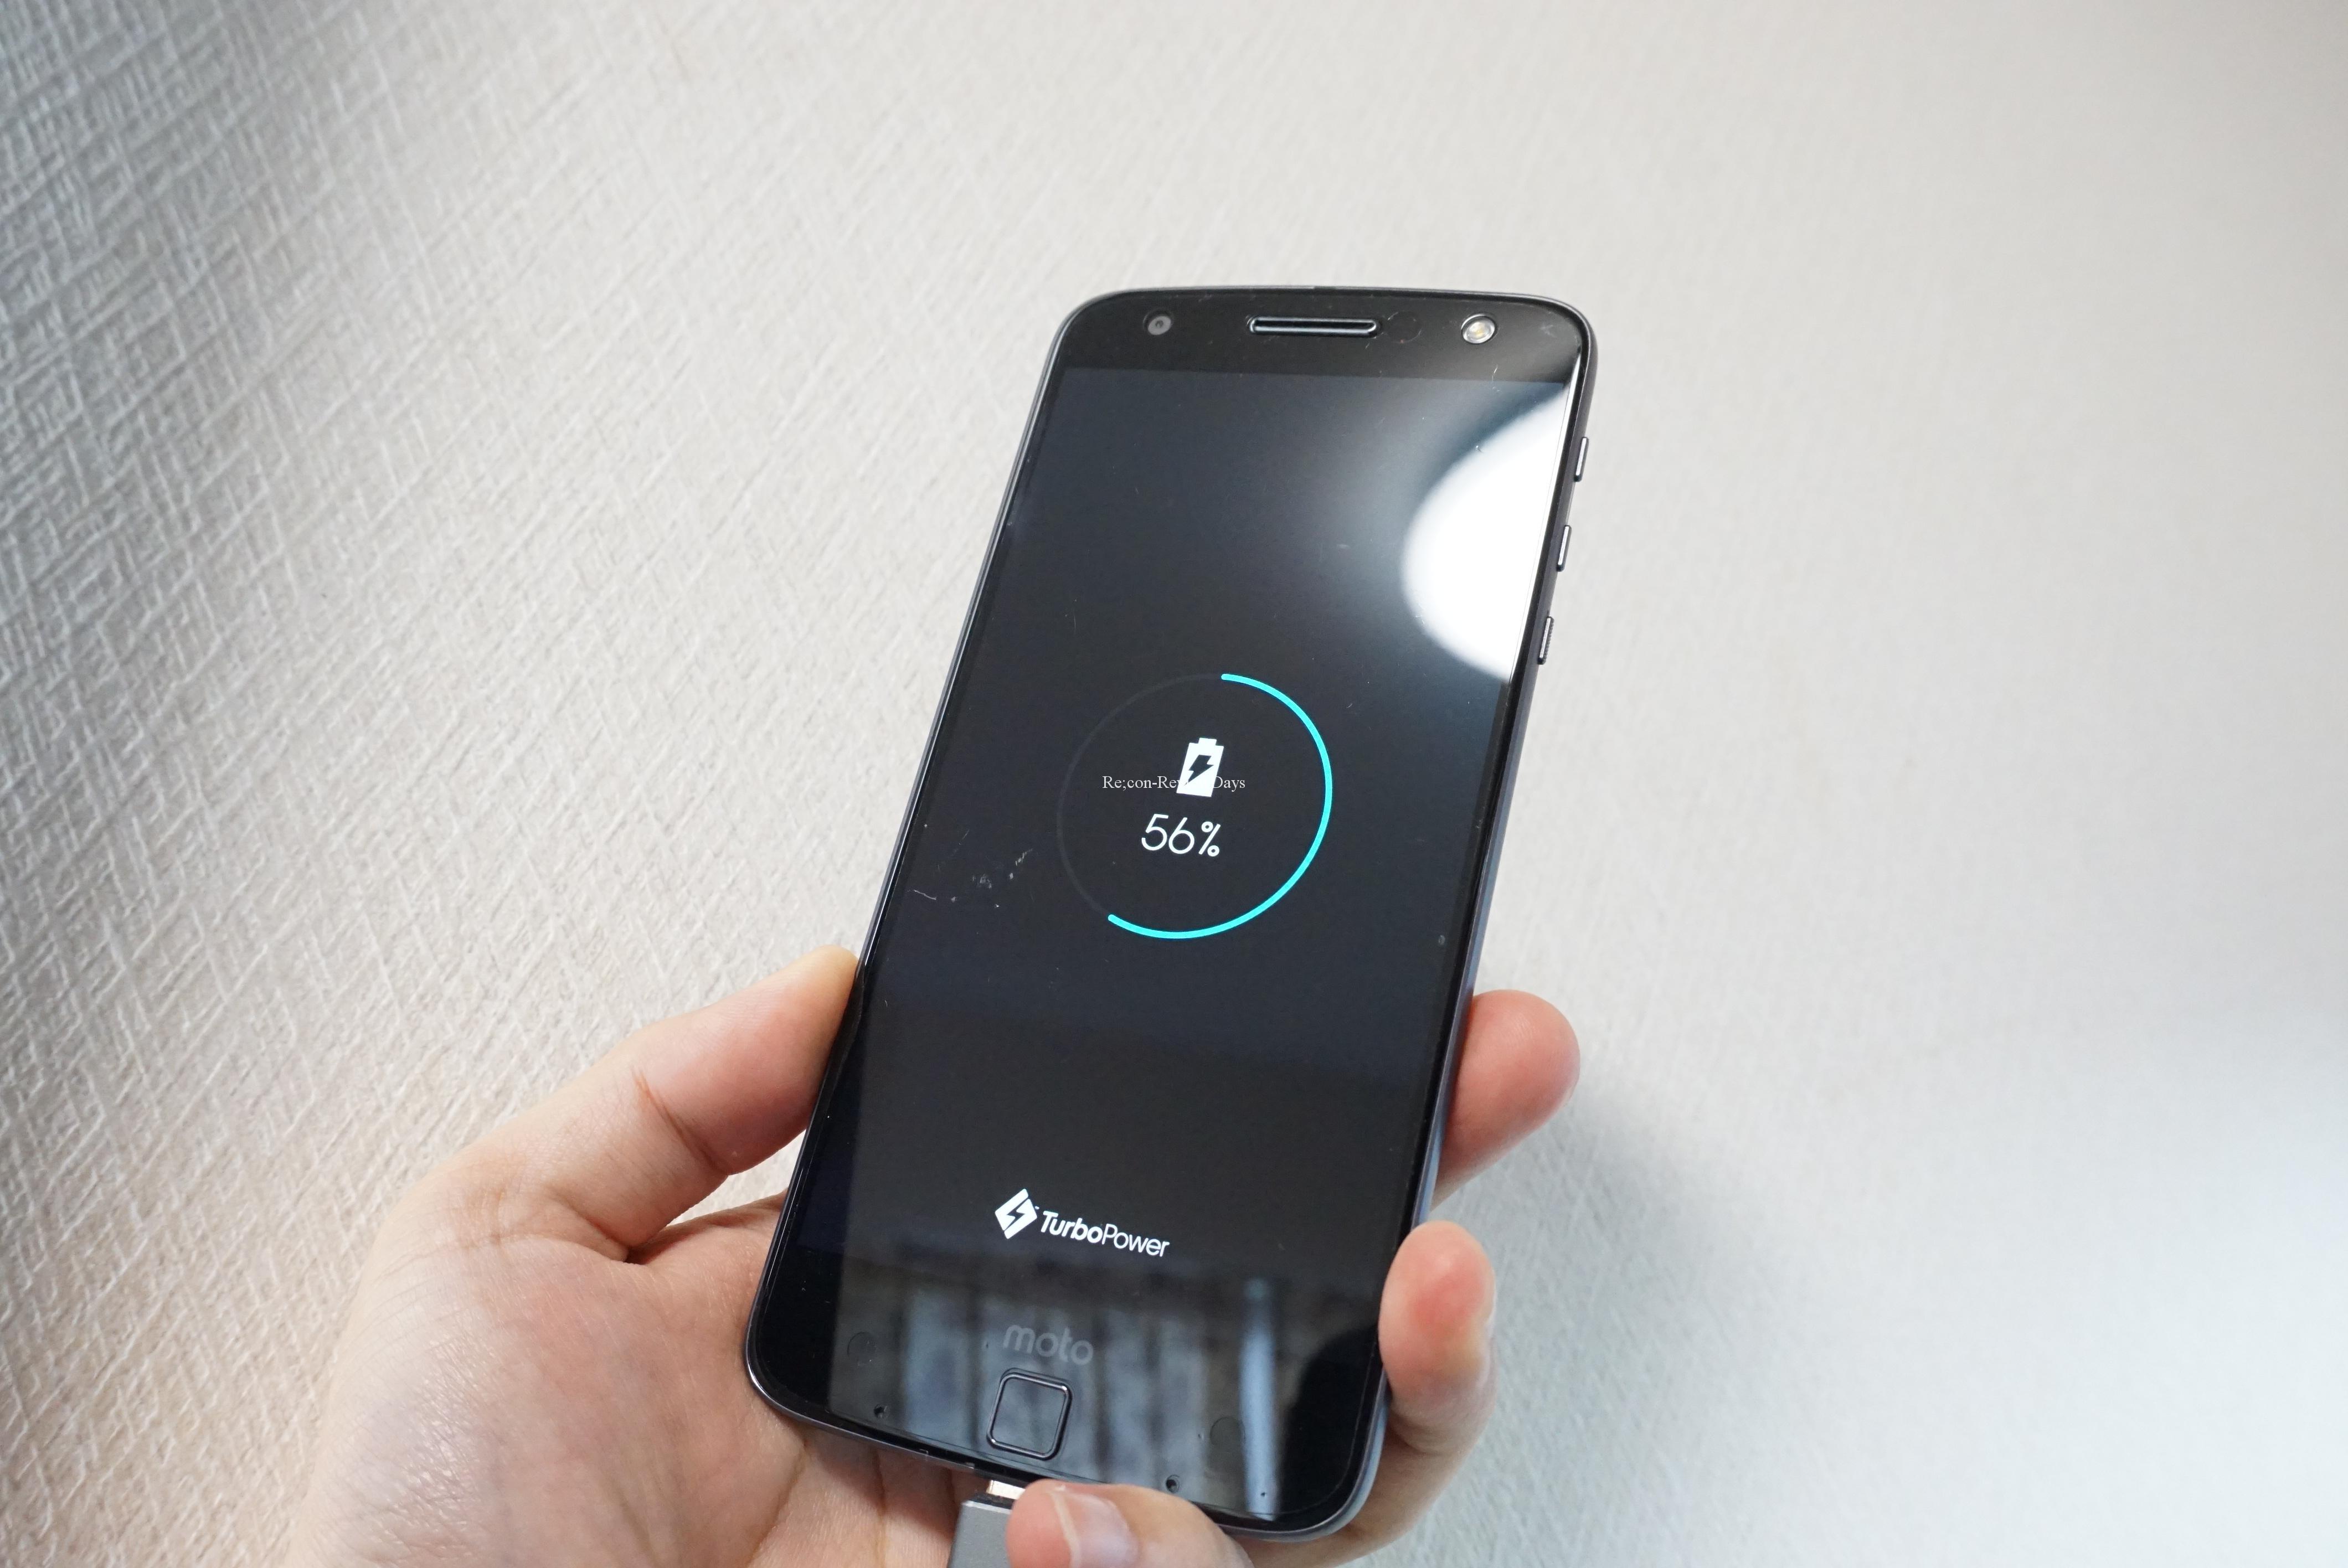 Motorola Moto Zのバッテリーが劣化によりすぐ電源が落ちるようになりました #Motorola #MotoZ #XT1650